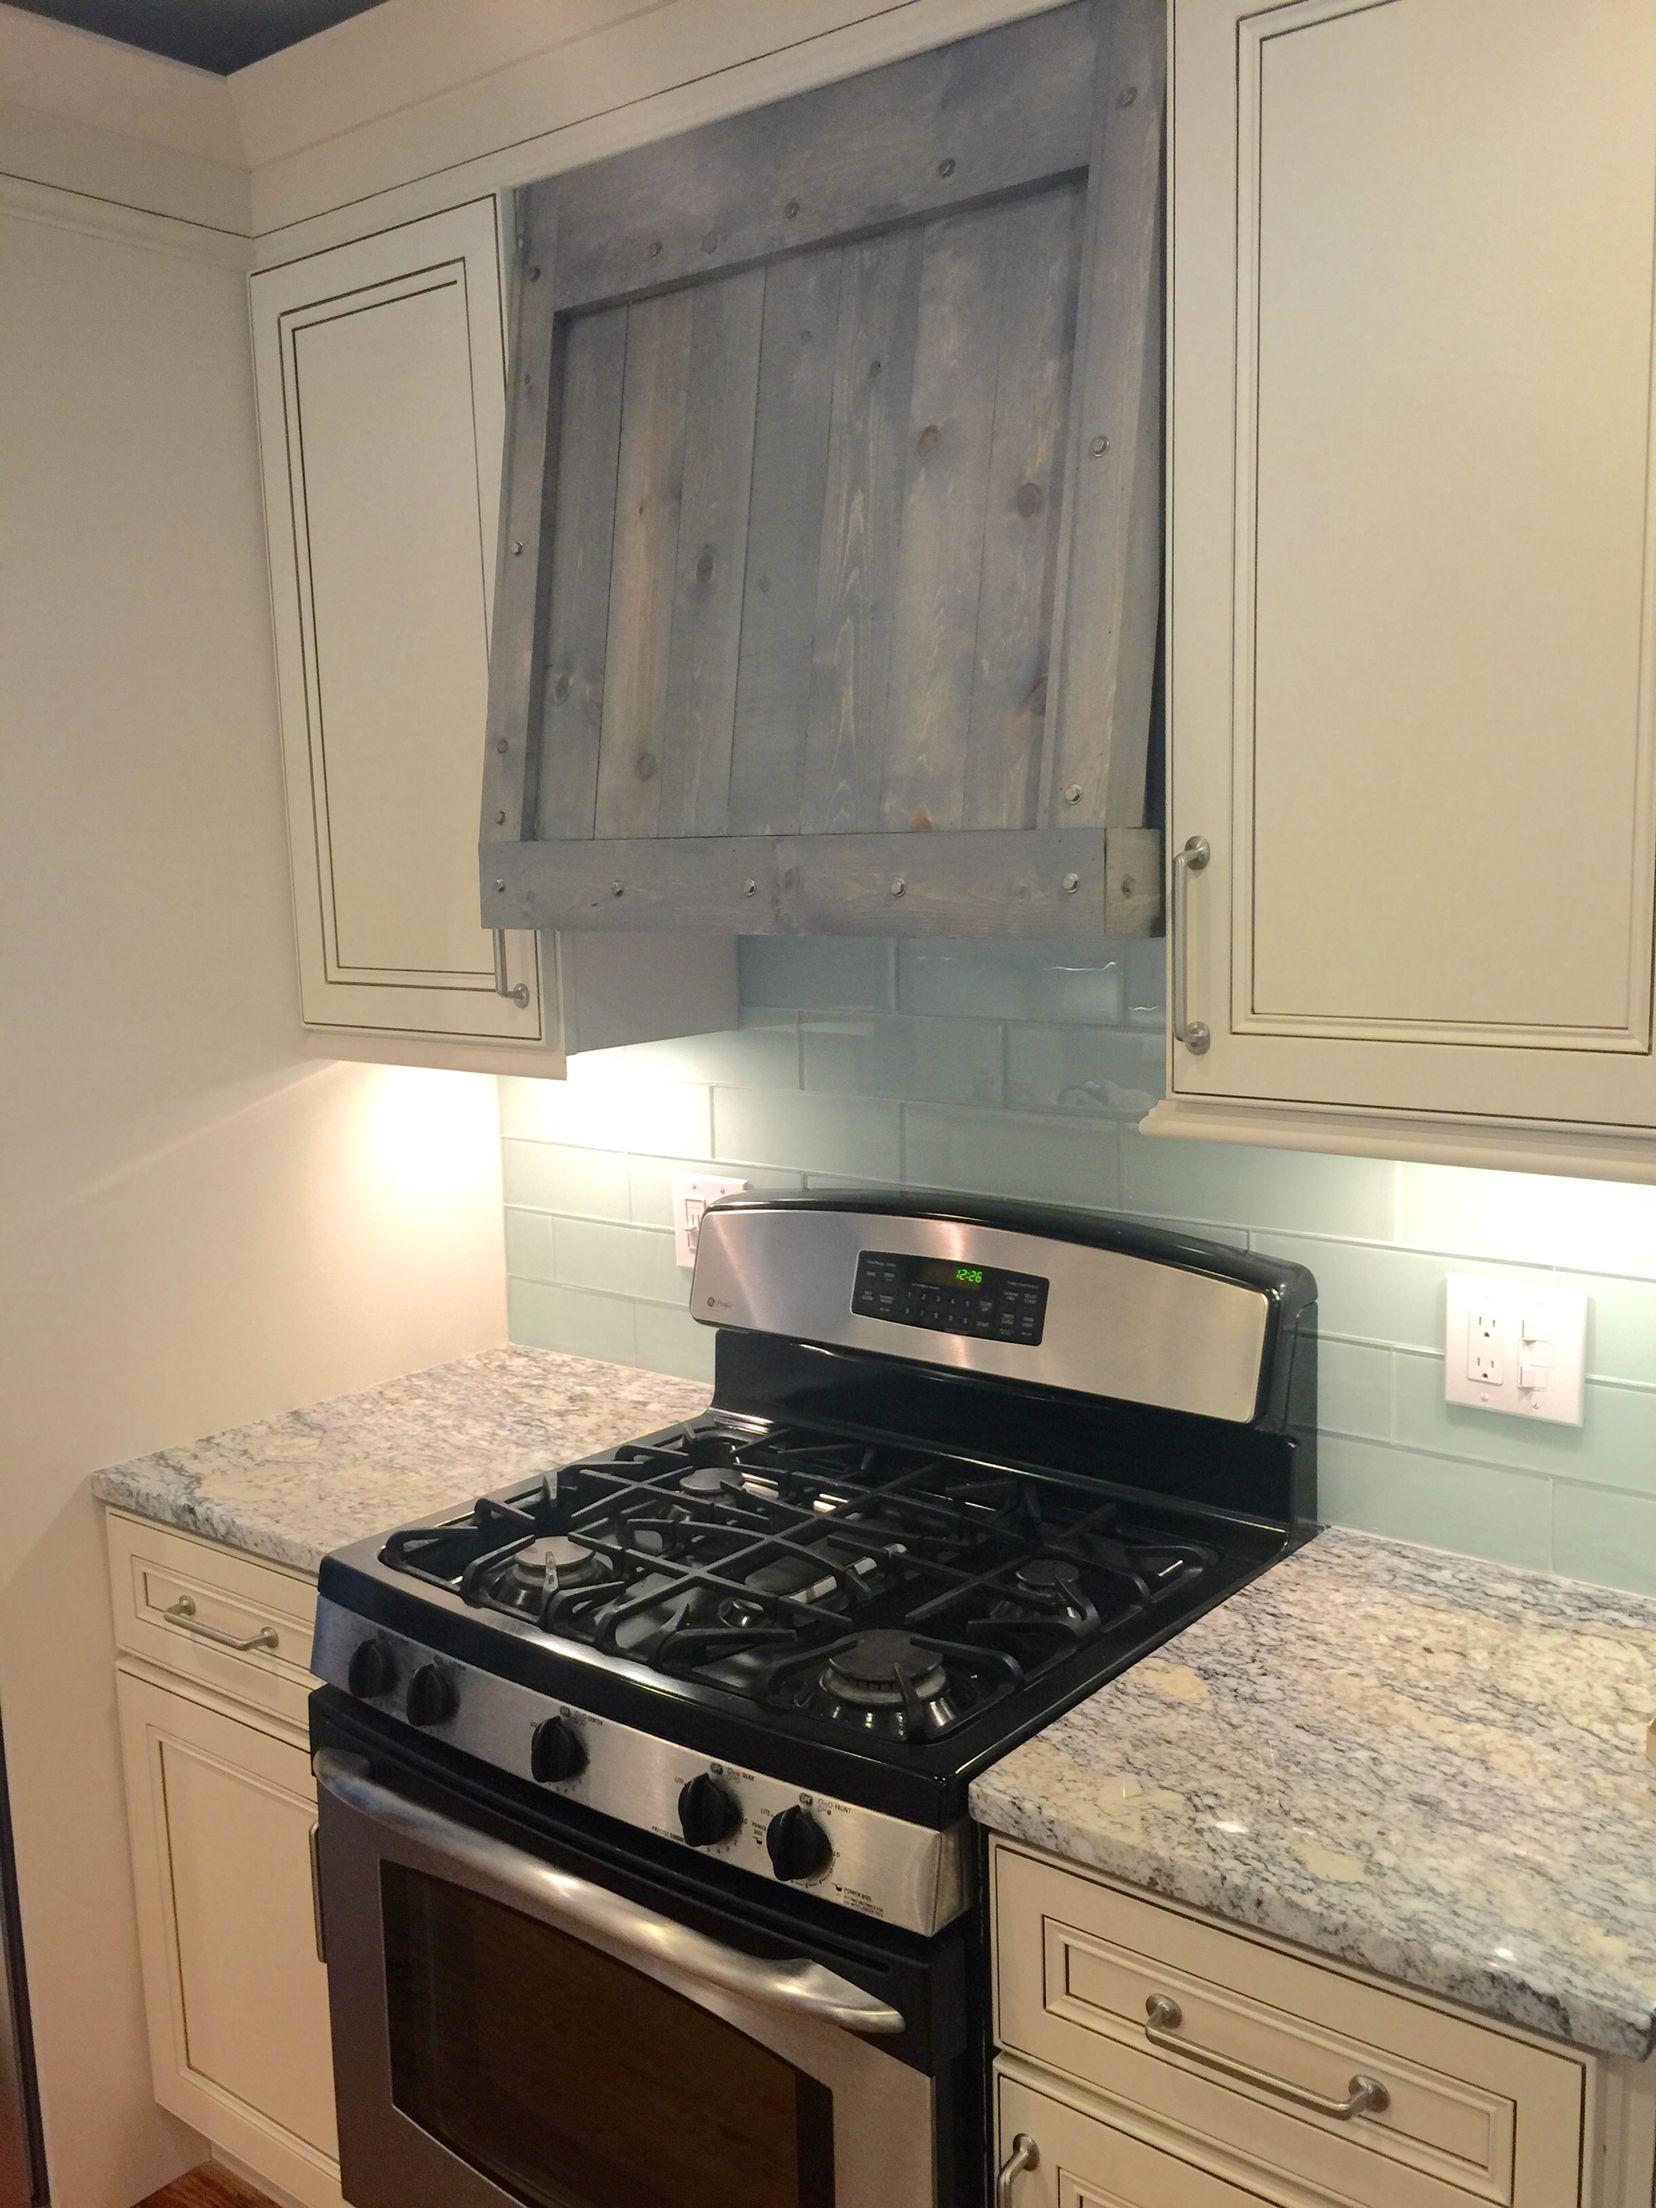 Rustic chic kitchen | Custom driftwood/salvage range hood ...